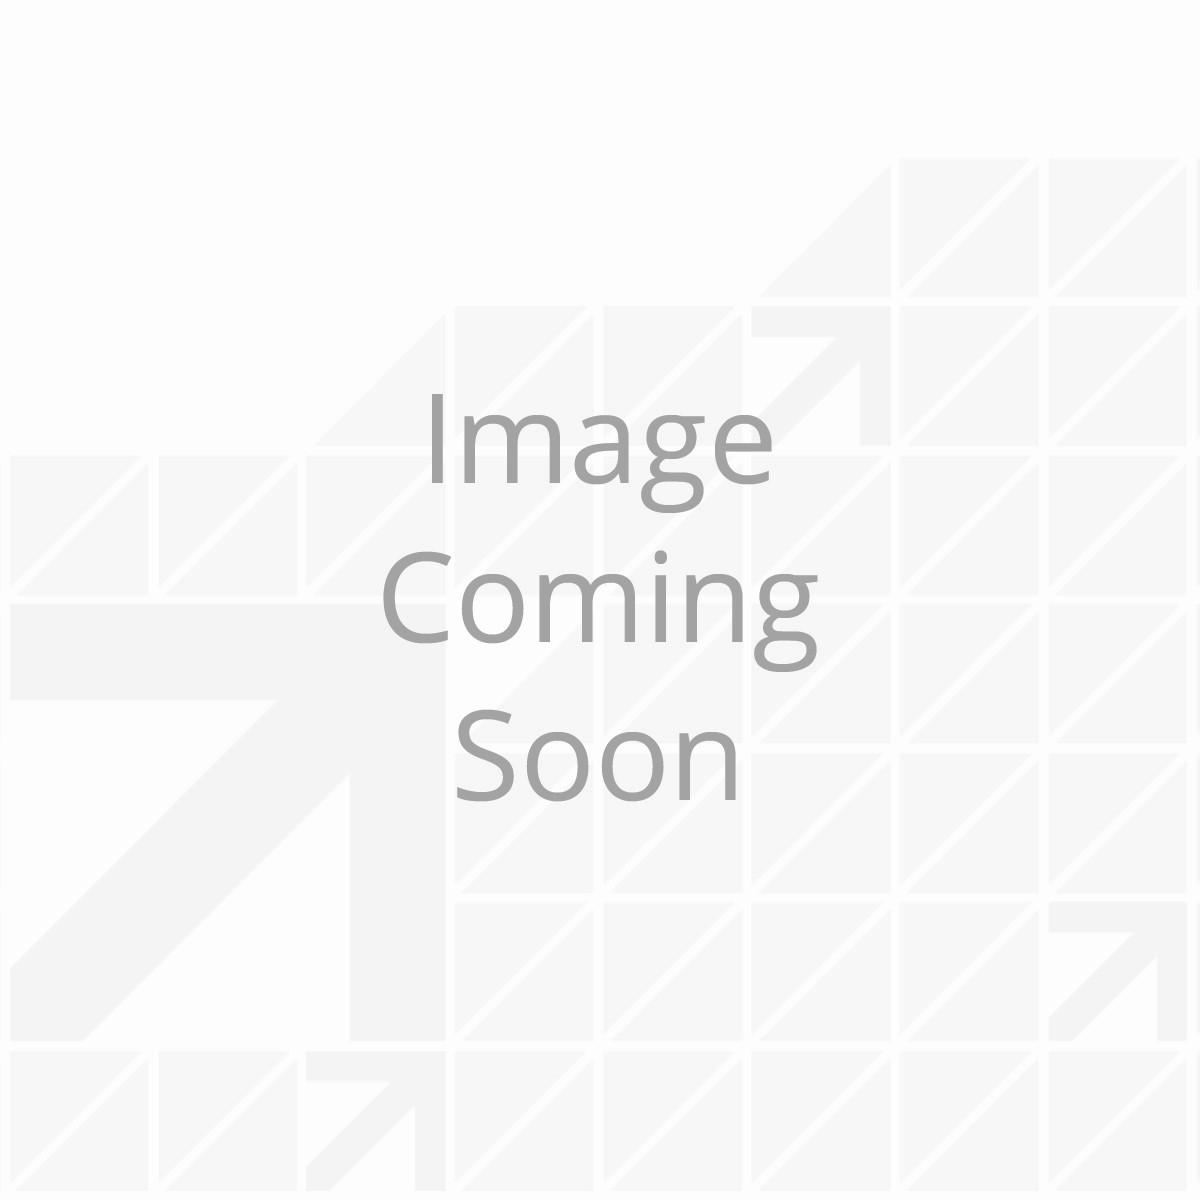 BikeWing™ Double Bike Carrier